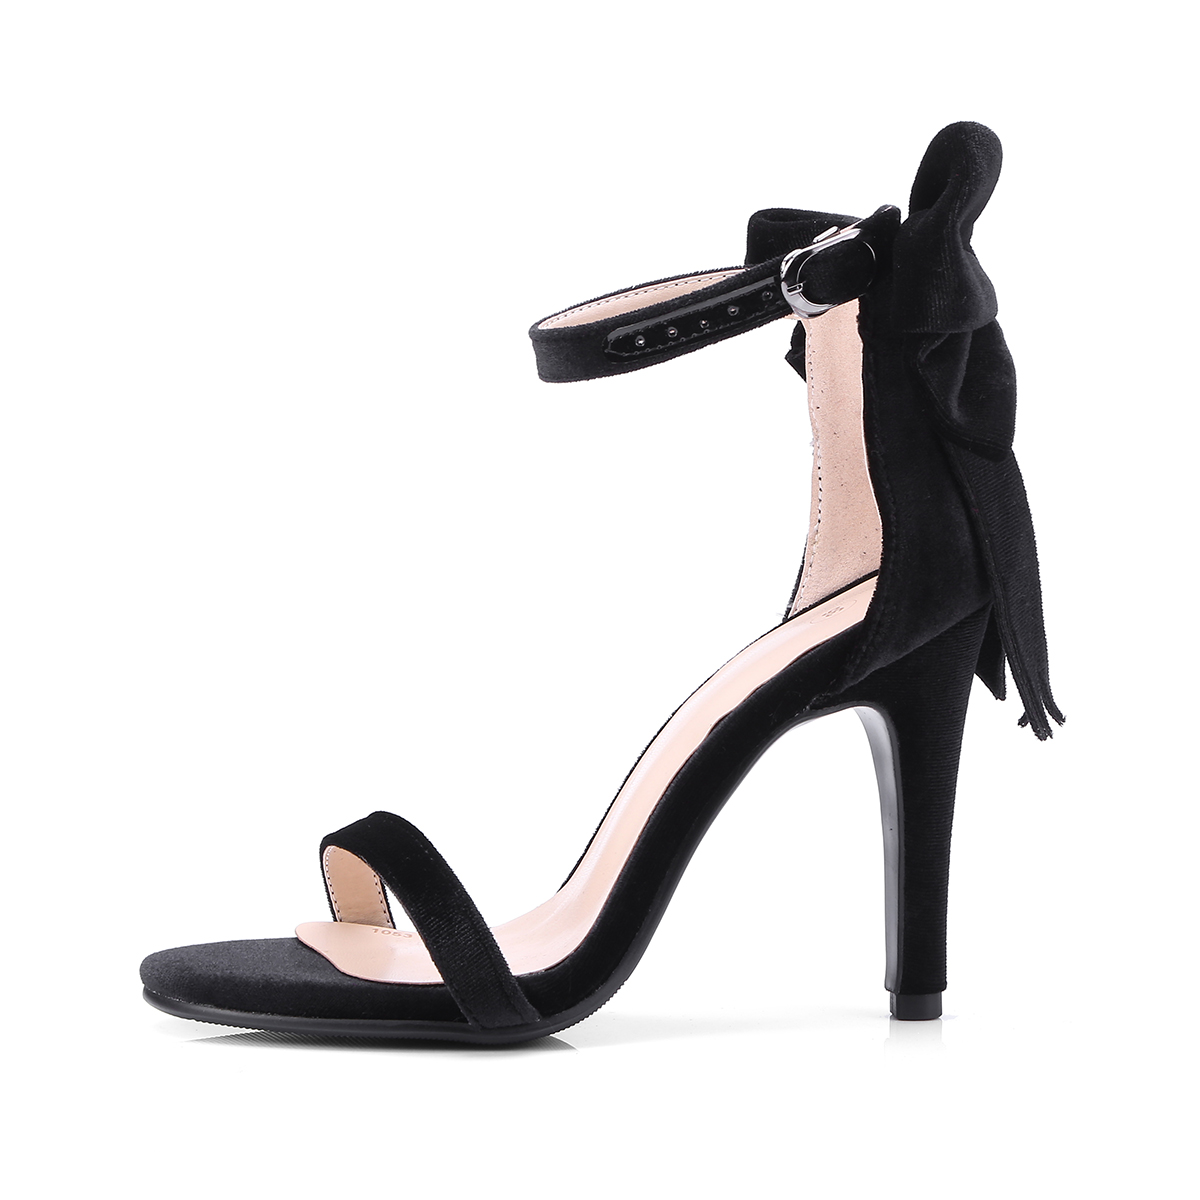 ce819f161436 US  60 - Arden Furtado 2018 summer blue red fashion high heels 10cm  stilettos butterfly knot ankle strap big size 40-43 elegant sandals -  www.ardenfurtado. ...